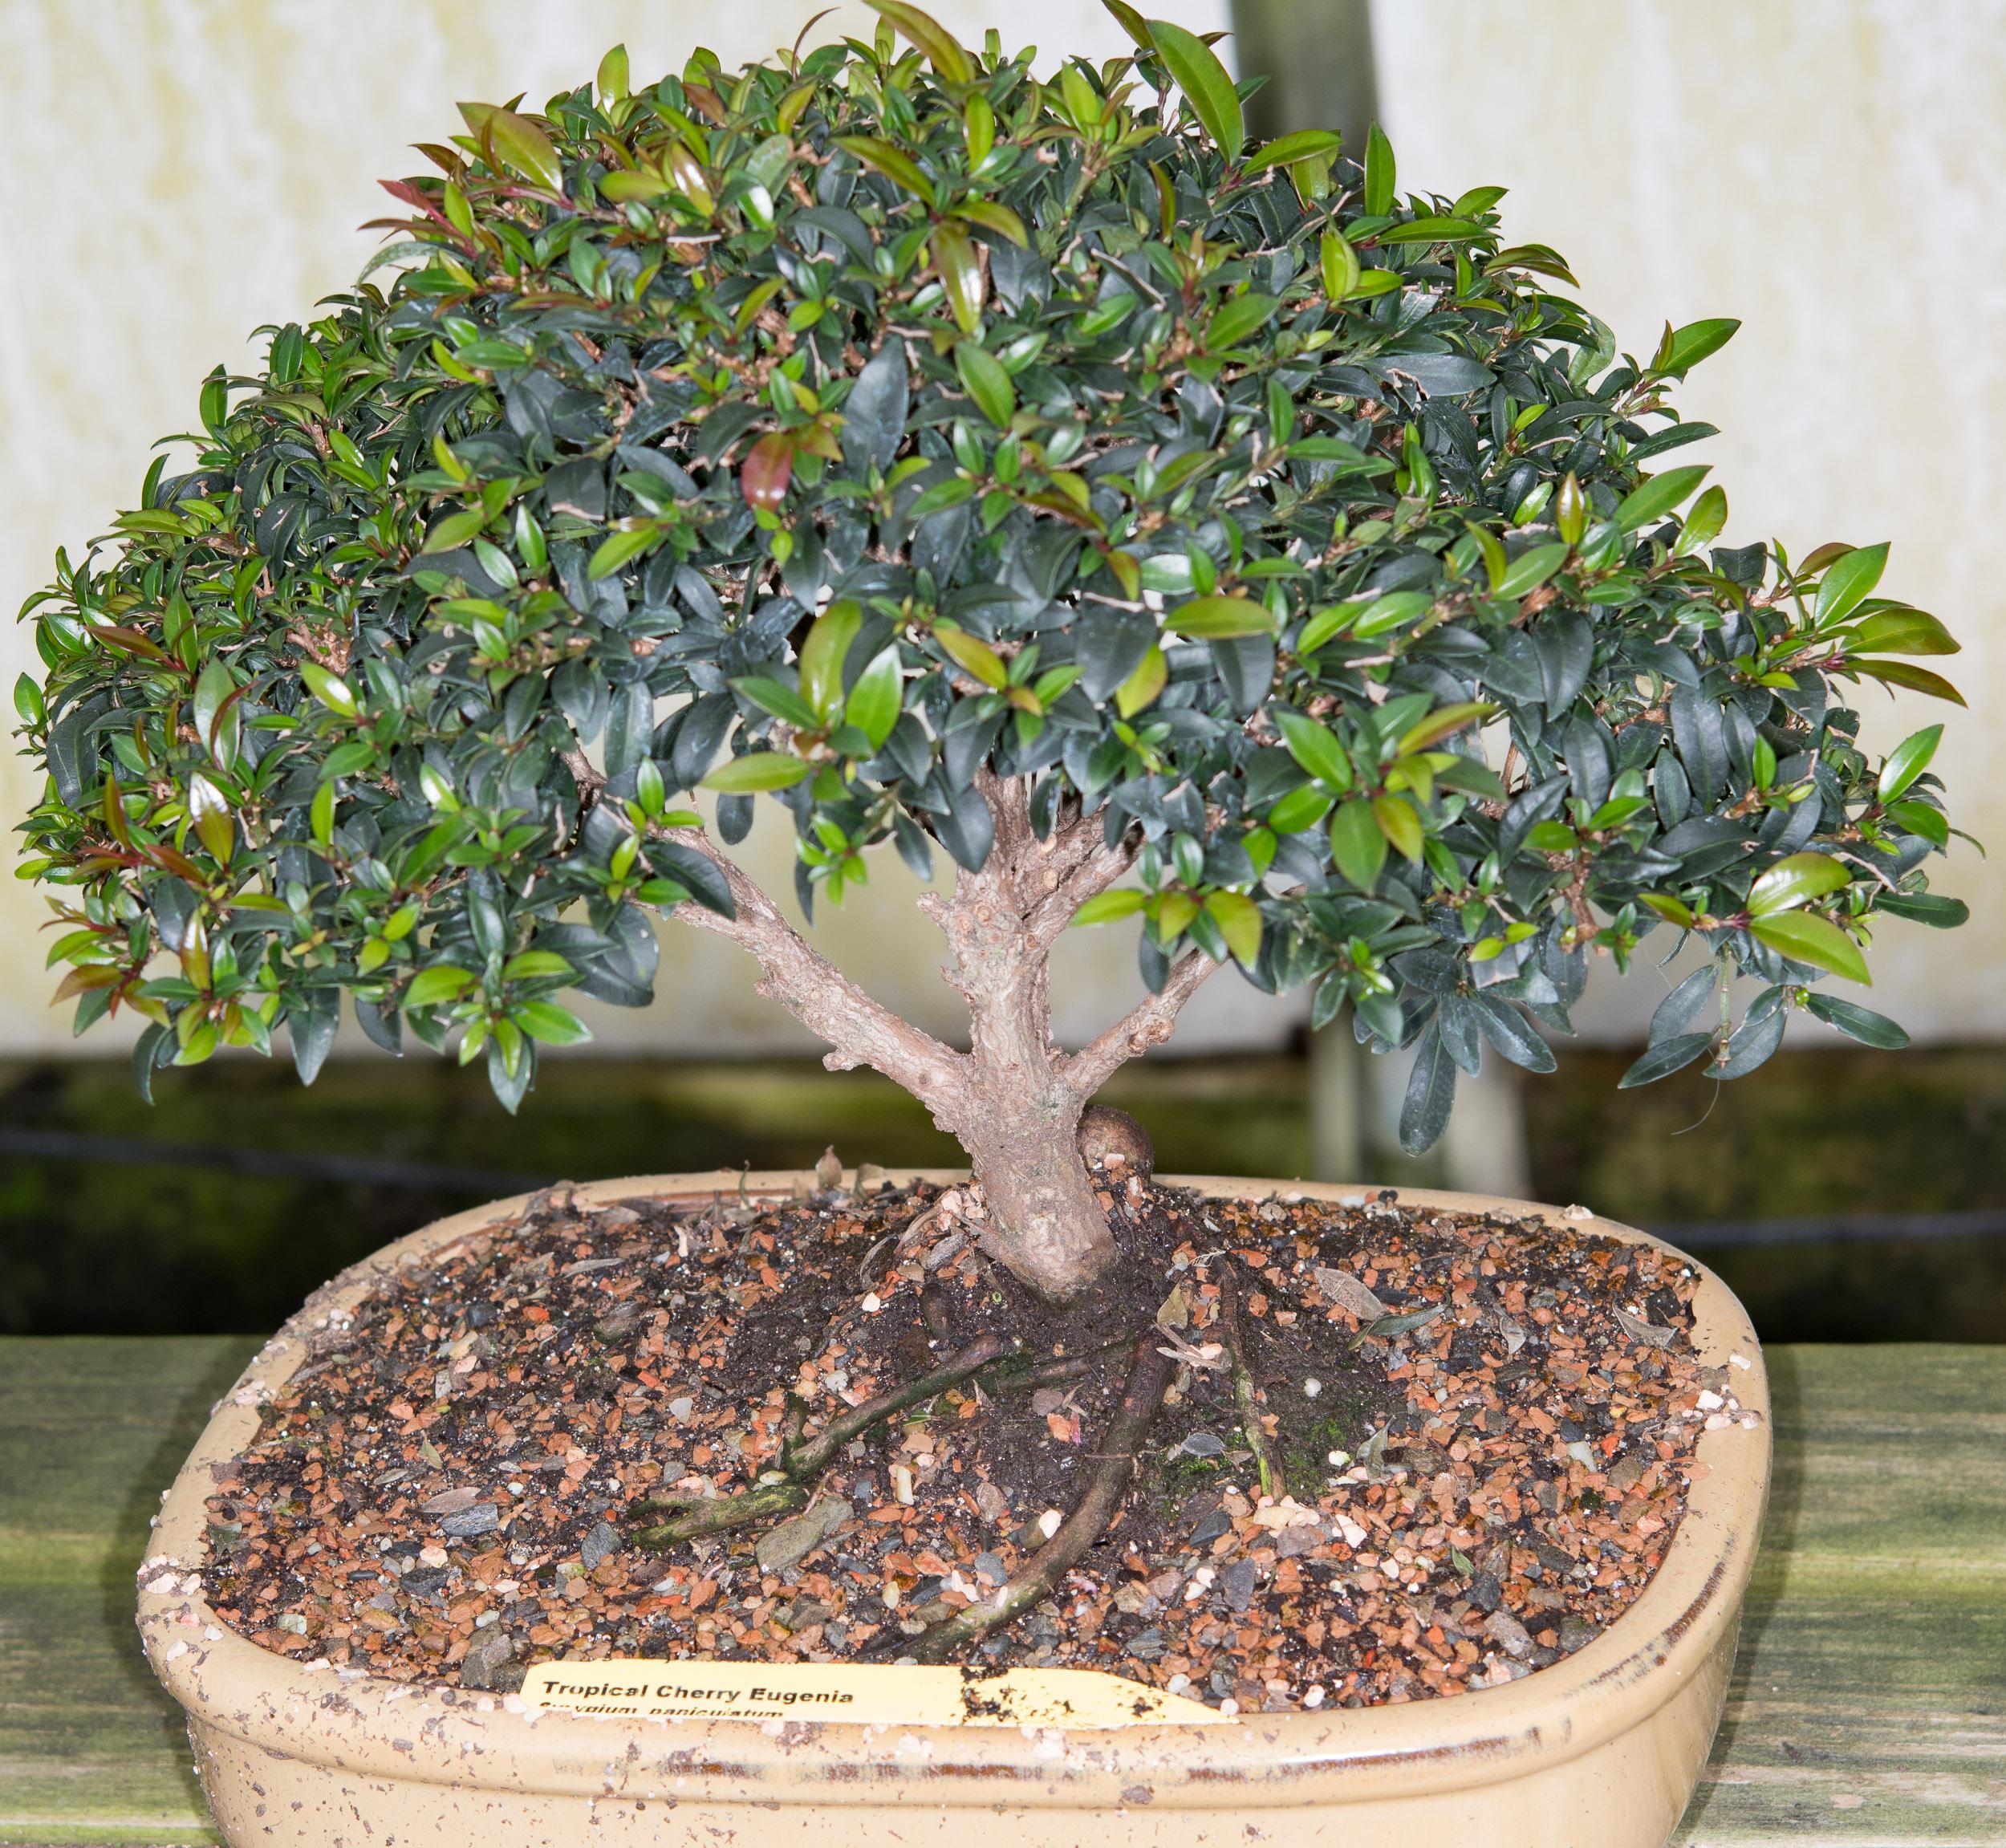 Syzygium Paniculatum Tropical Cherry Eugenia